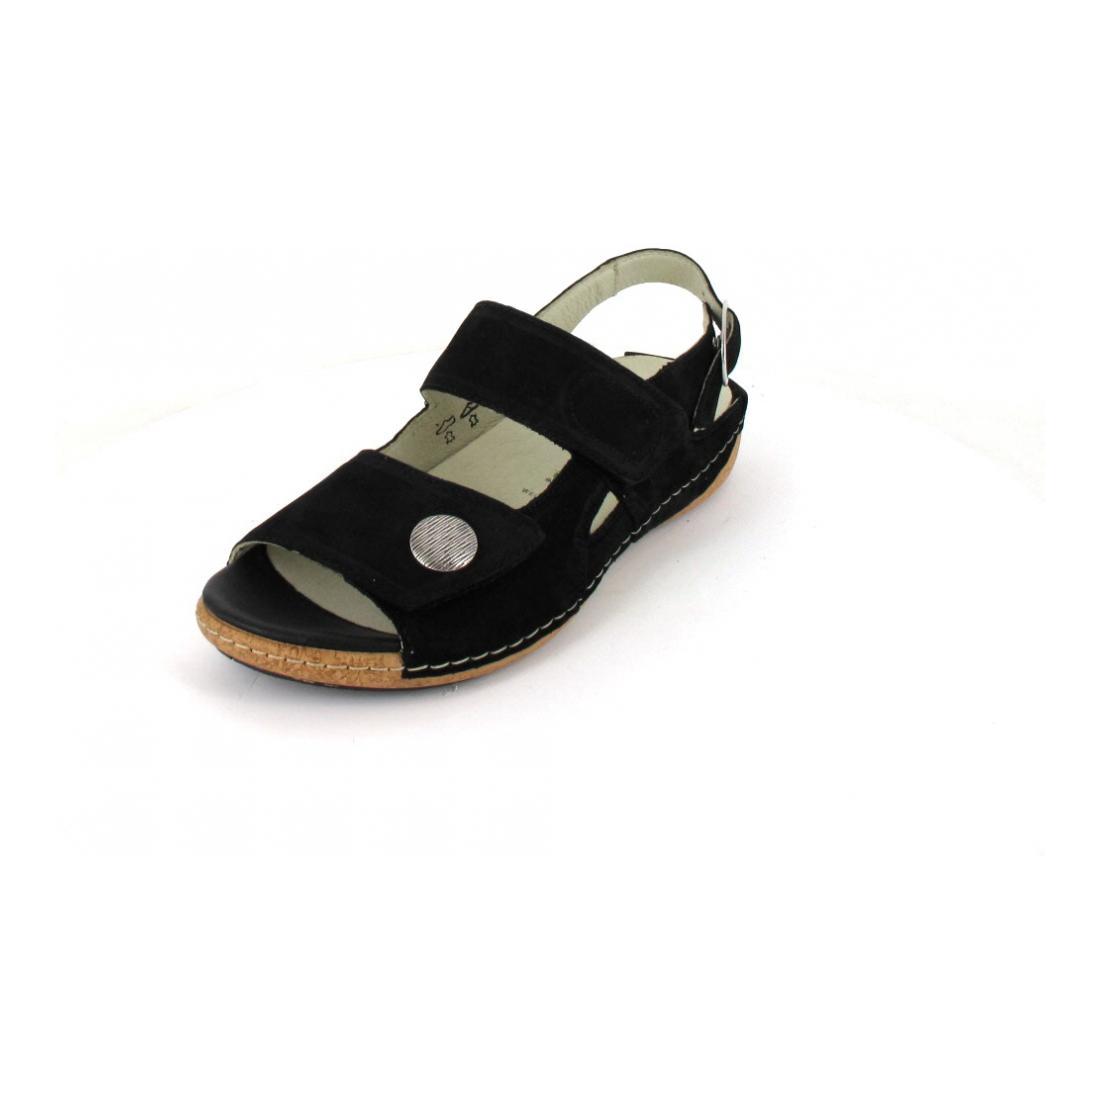 Waldläufer Sandale 342002-191-001